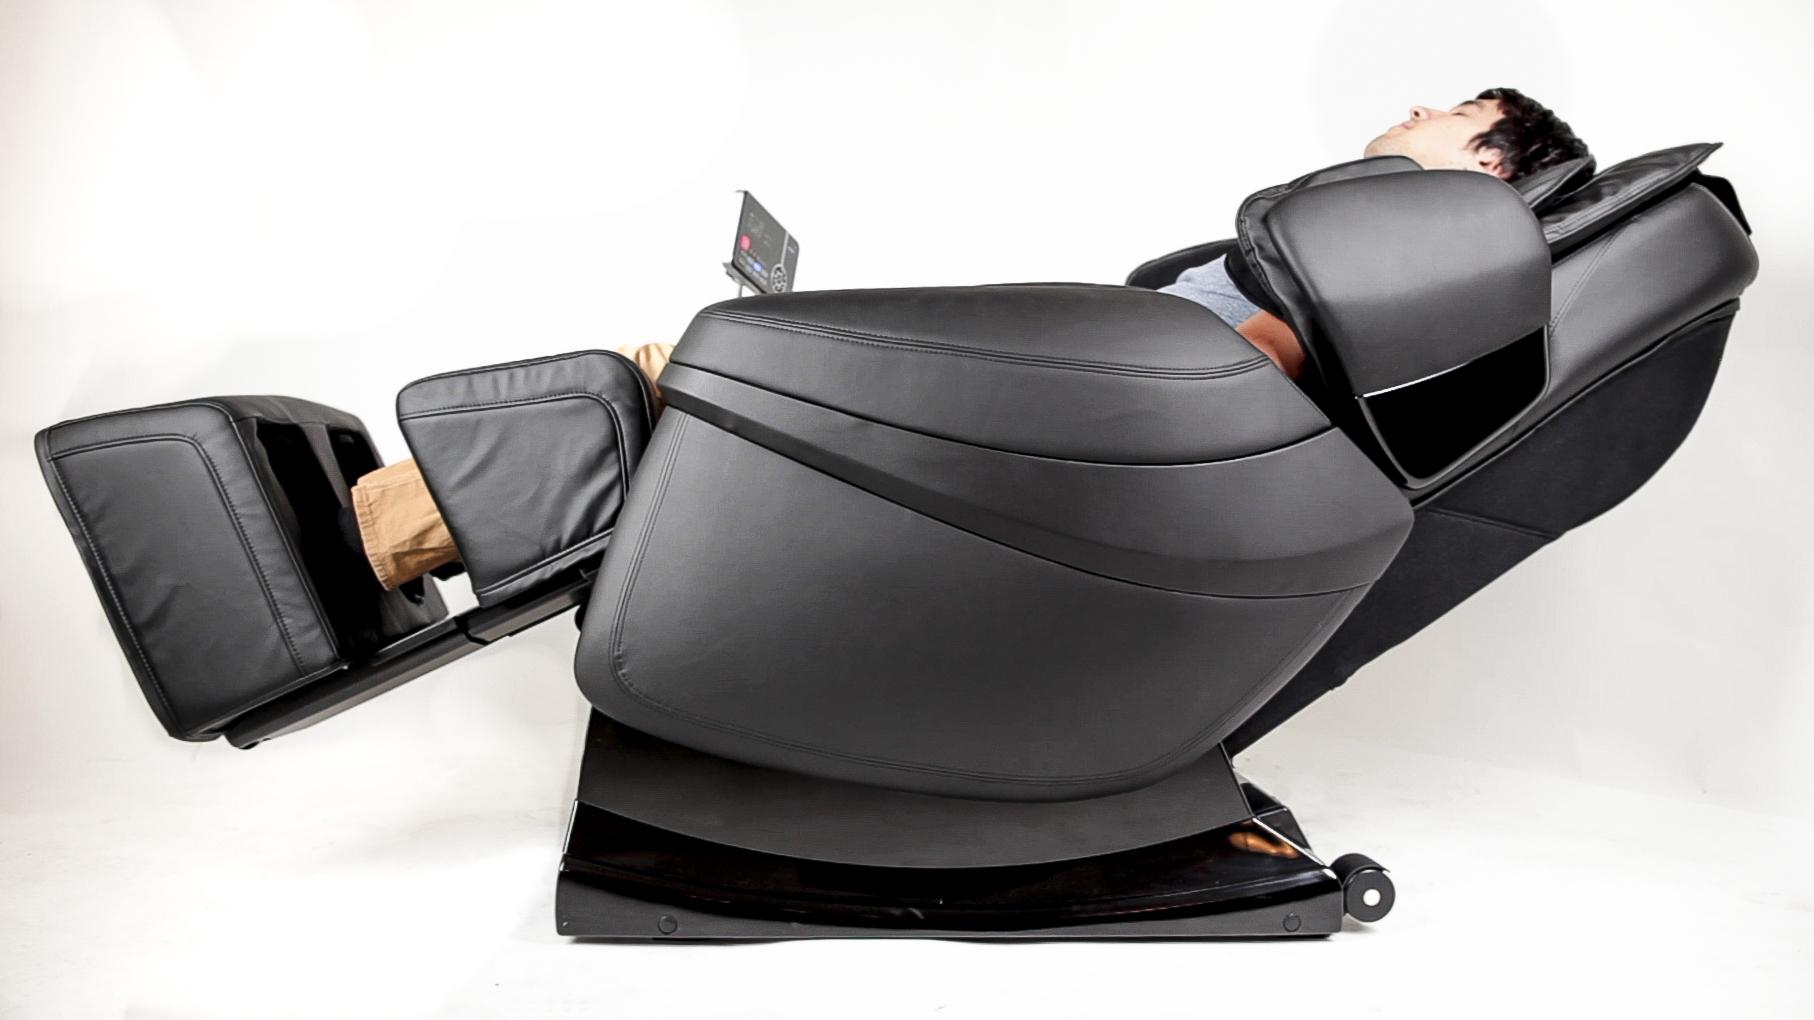 Full Body Massage Chair Johns Creek GA